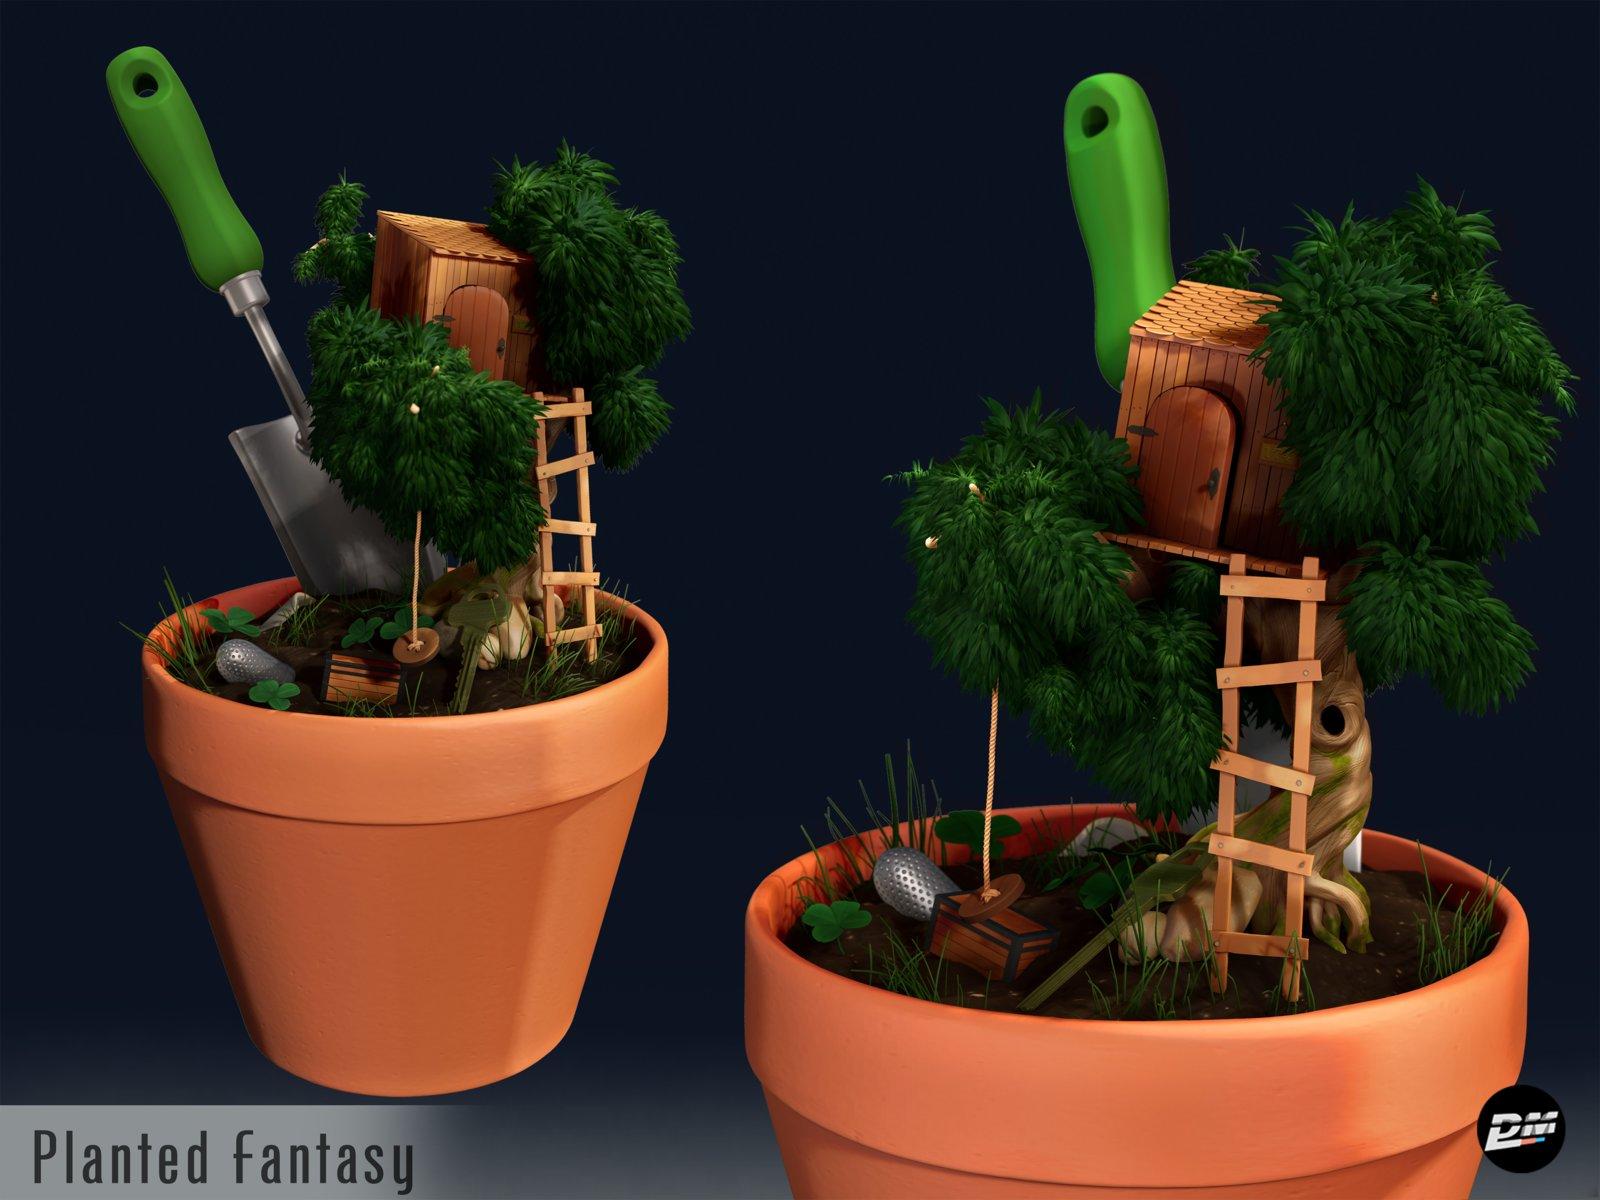 Planted Fantasy